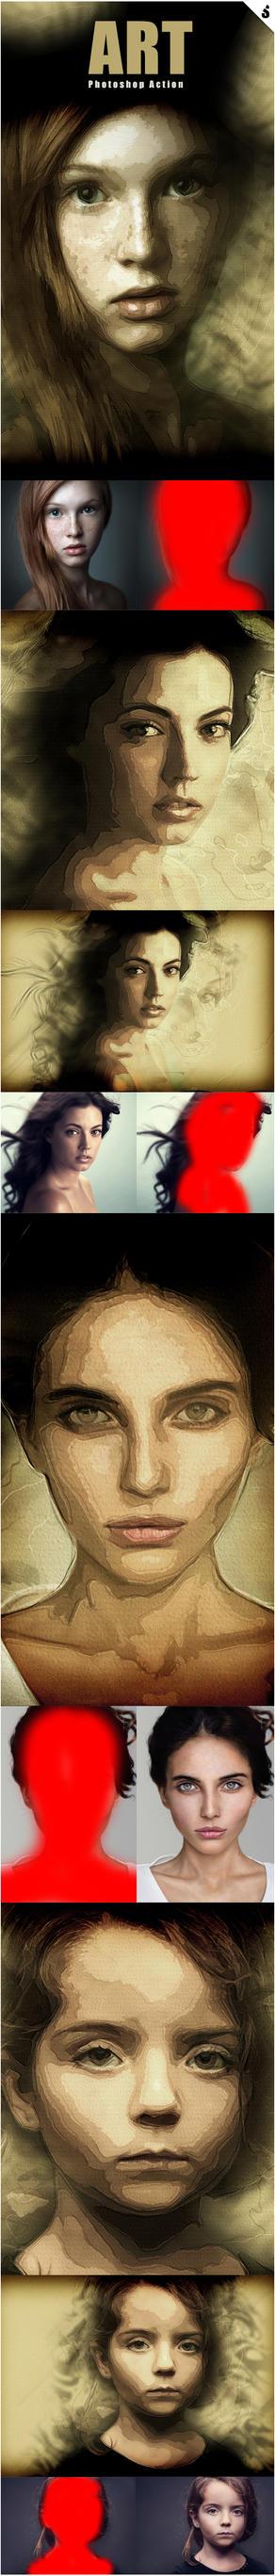 Art Photoshop Action by Kluzya